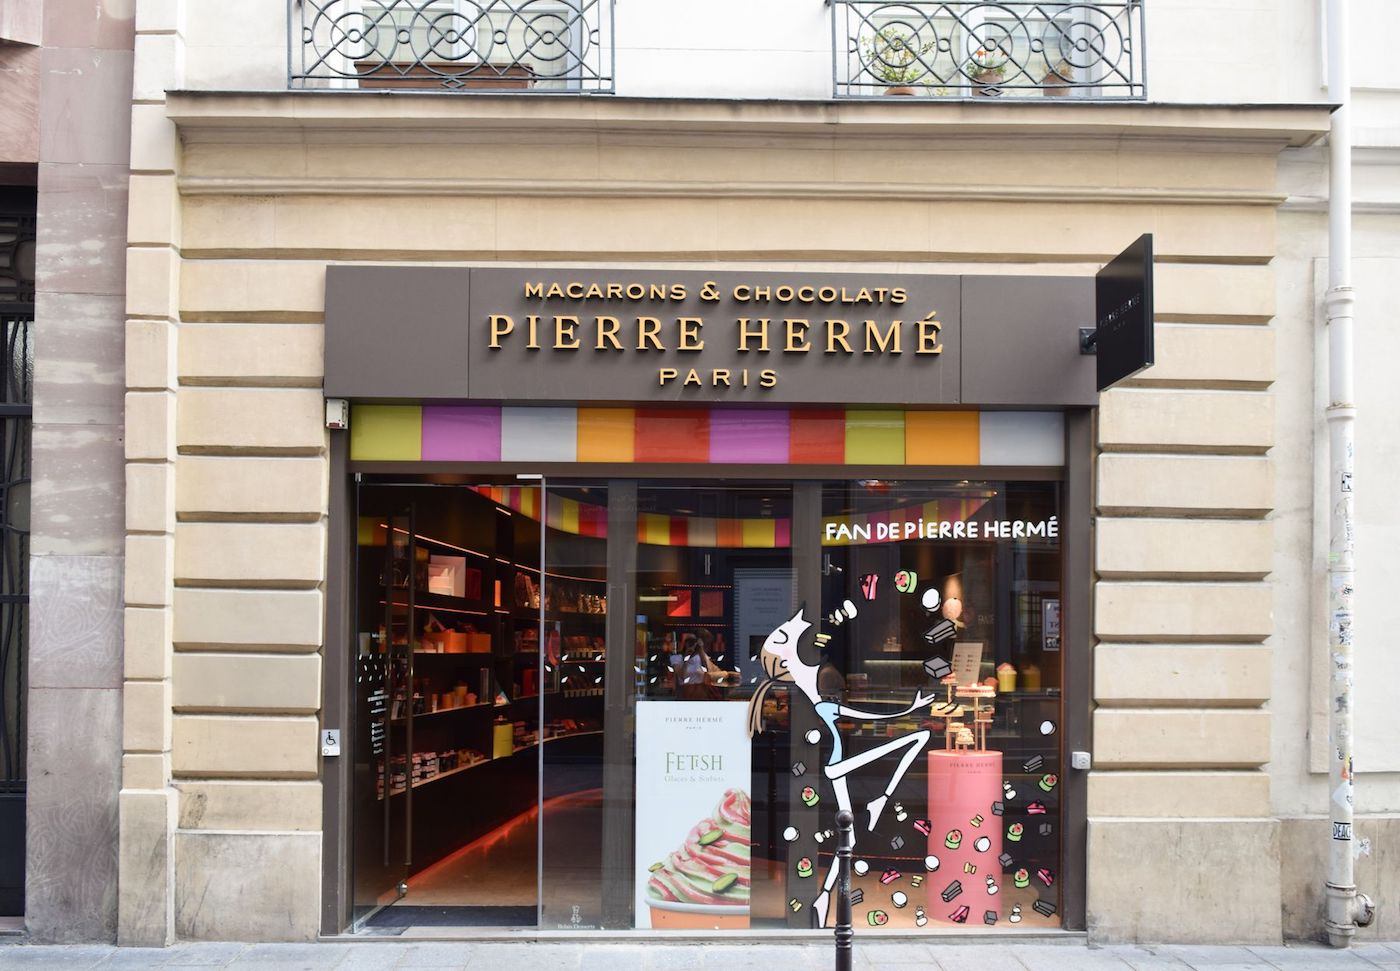 Best Macarons in Paris: Pierre Hermé, Paris